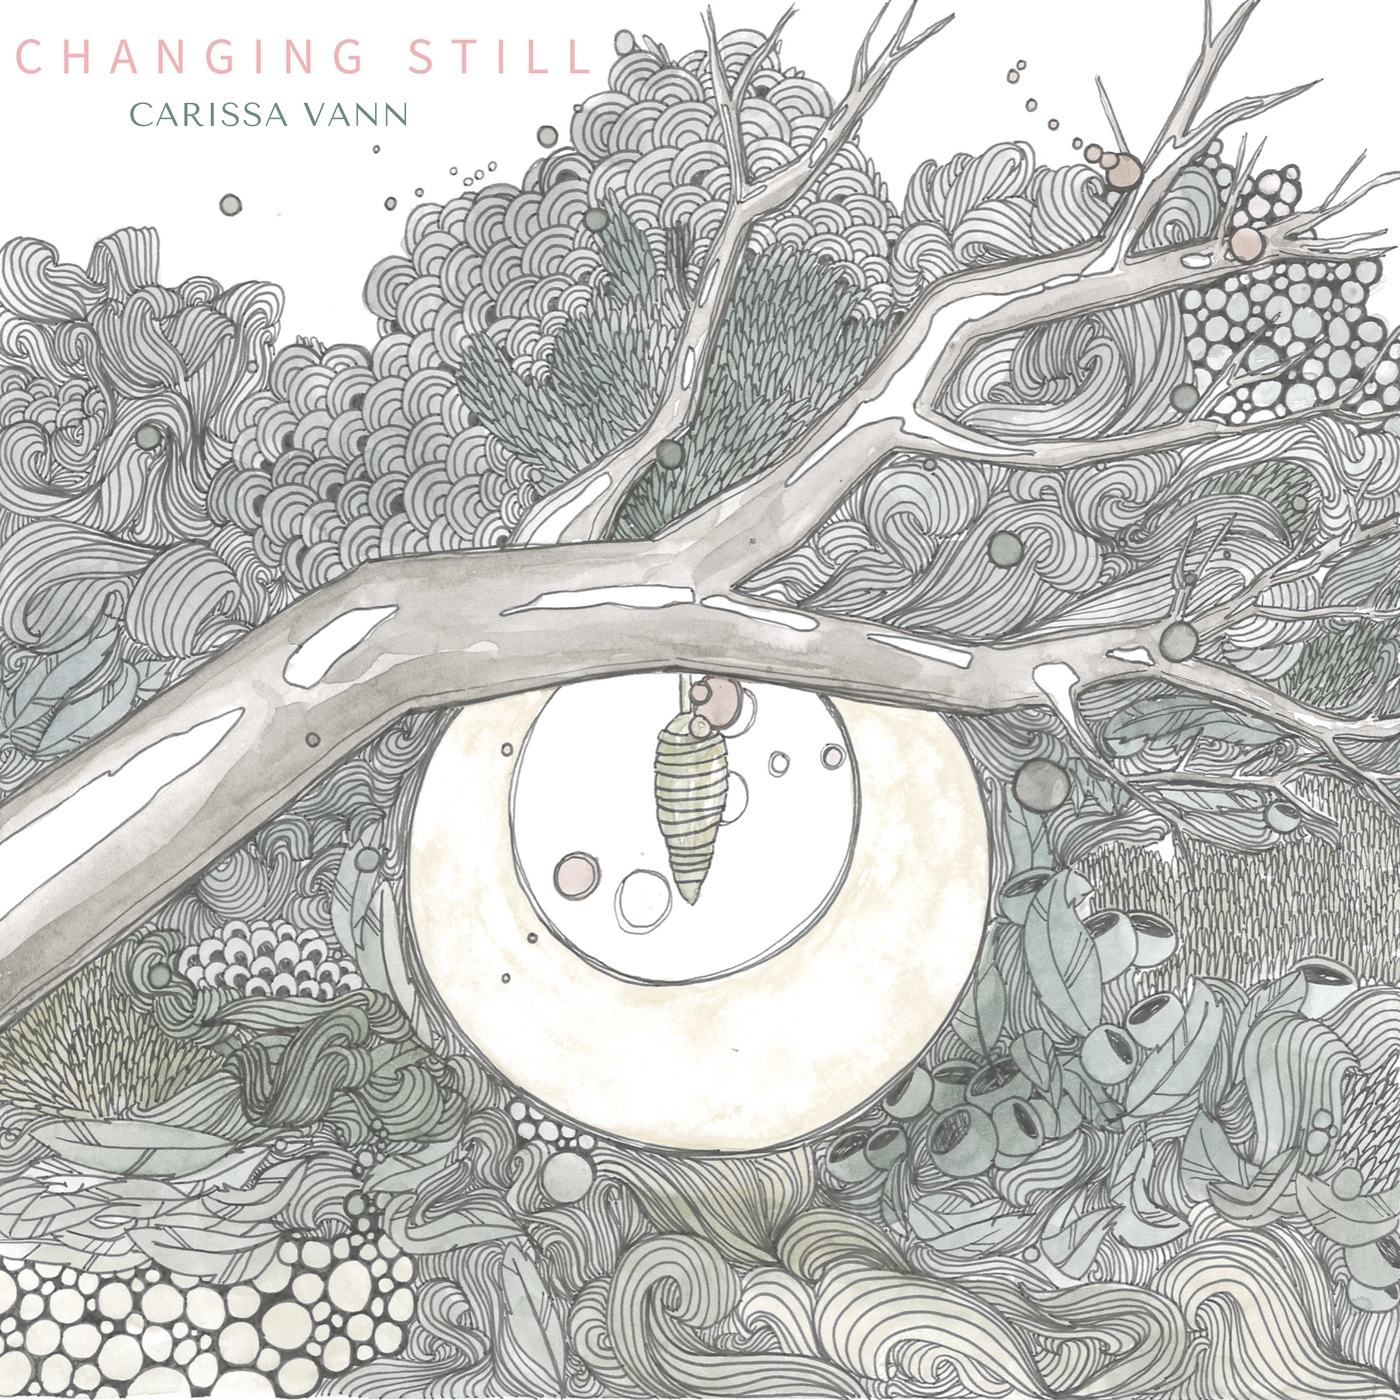 (Click the Album Cover to purchase a digital copy or pre-order the album)